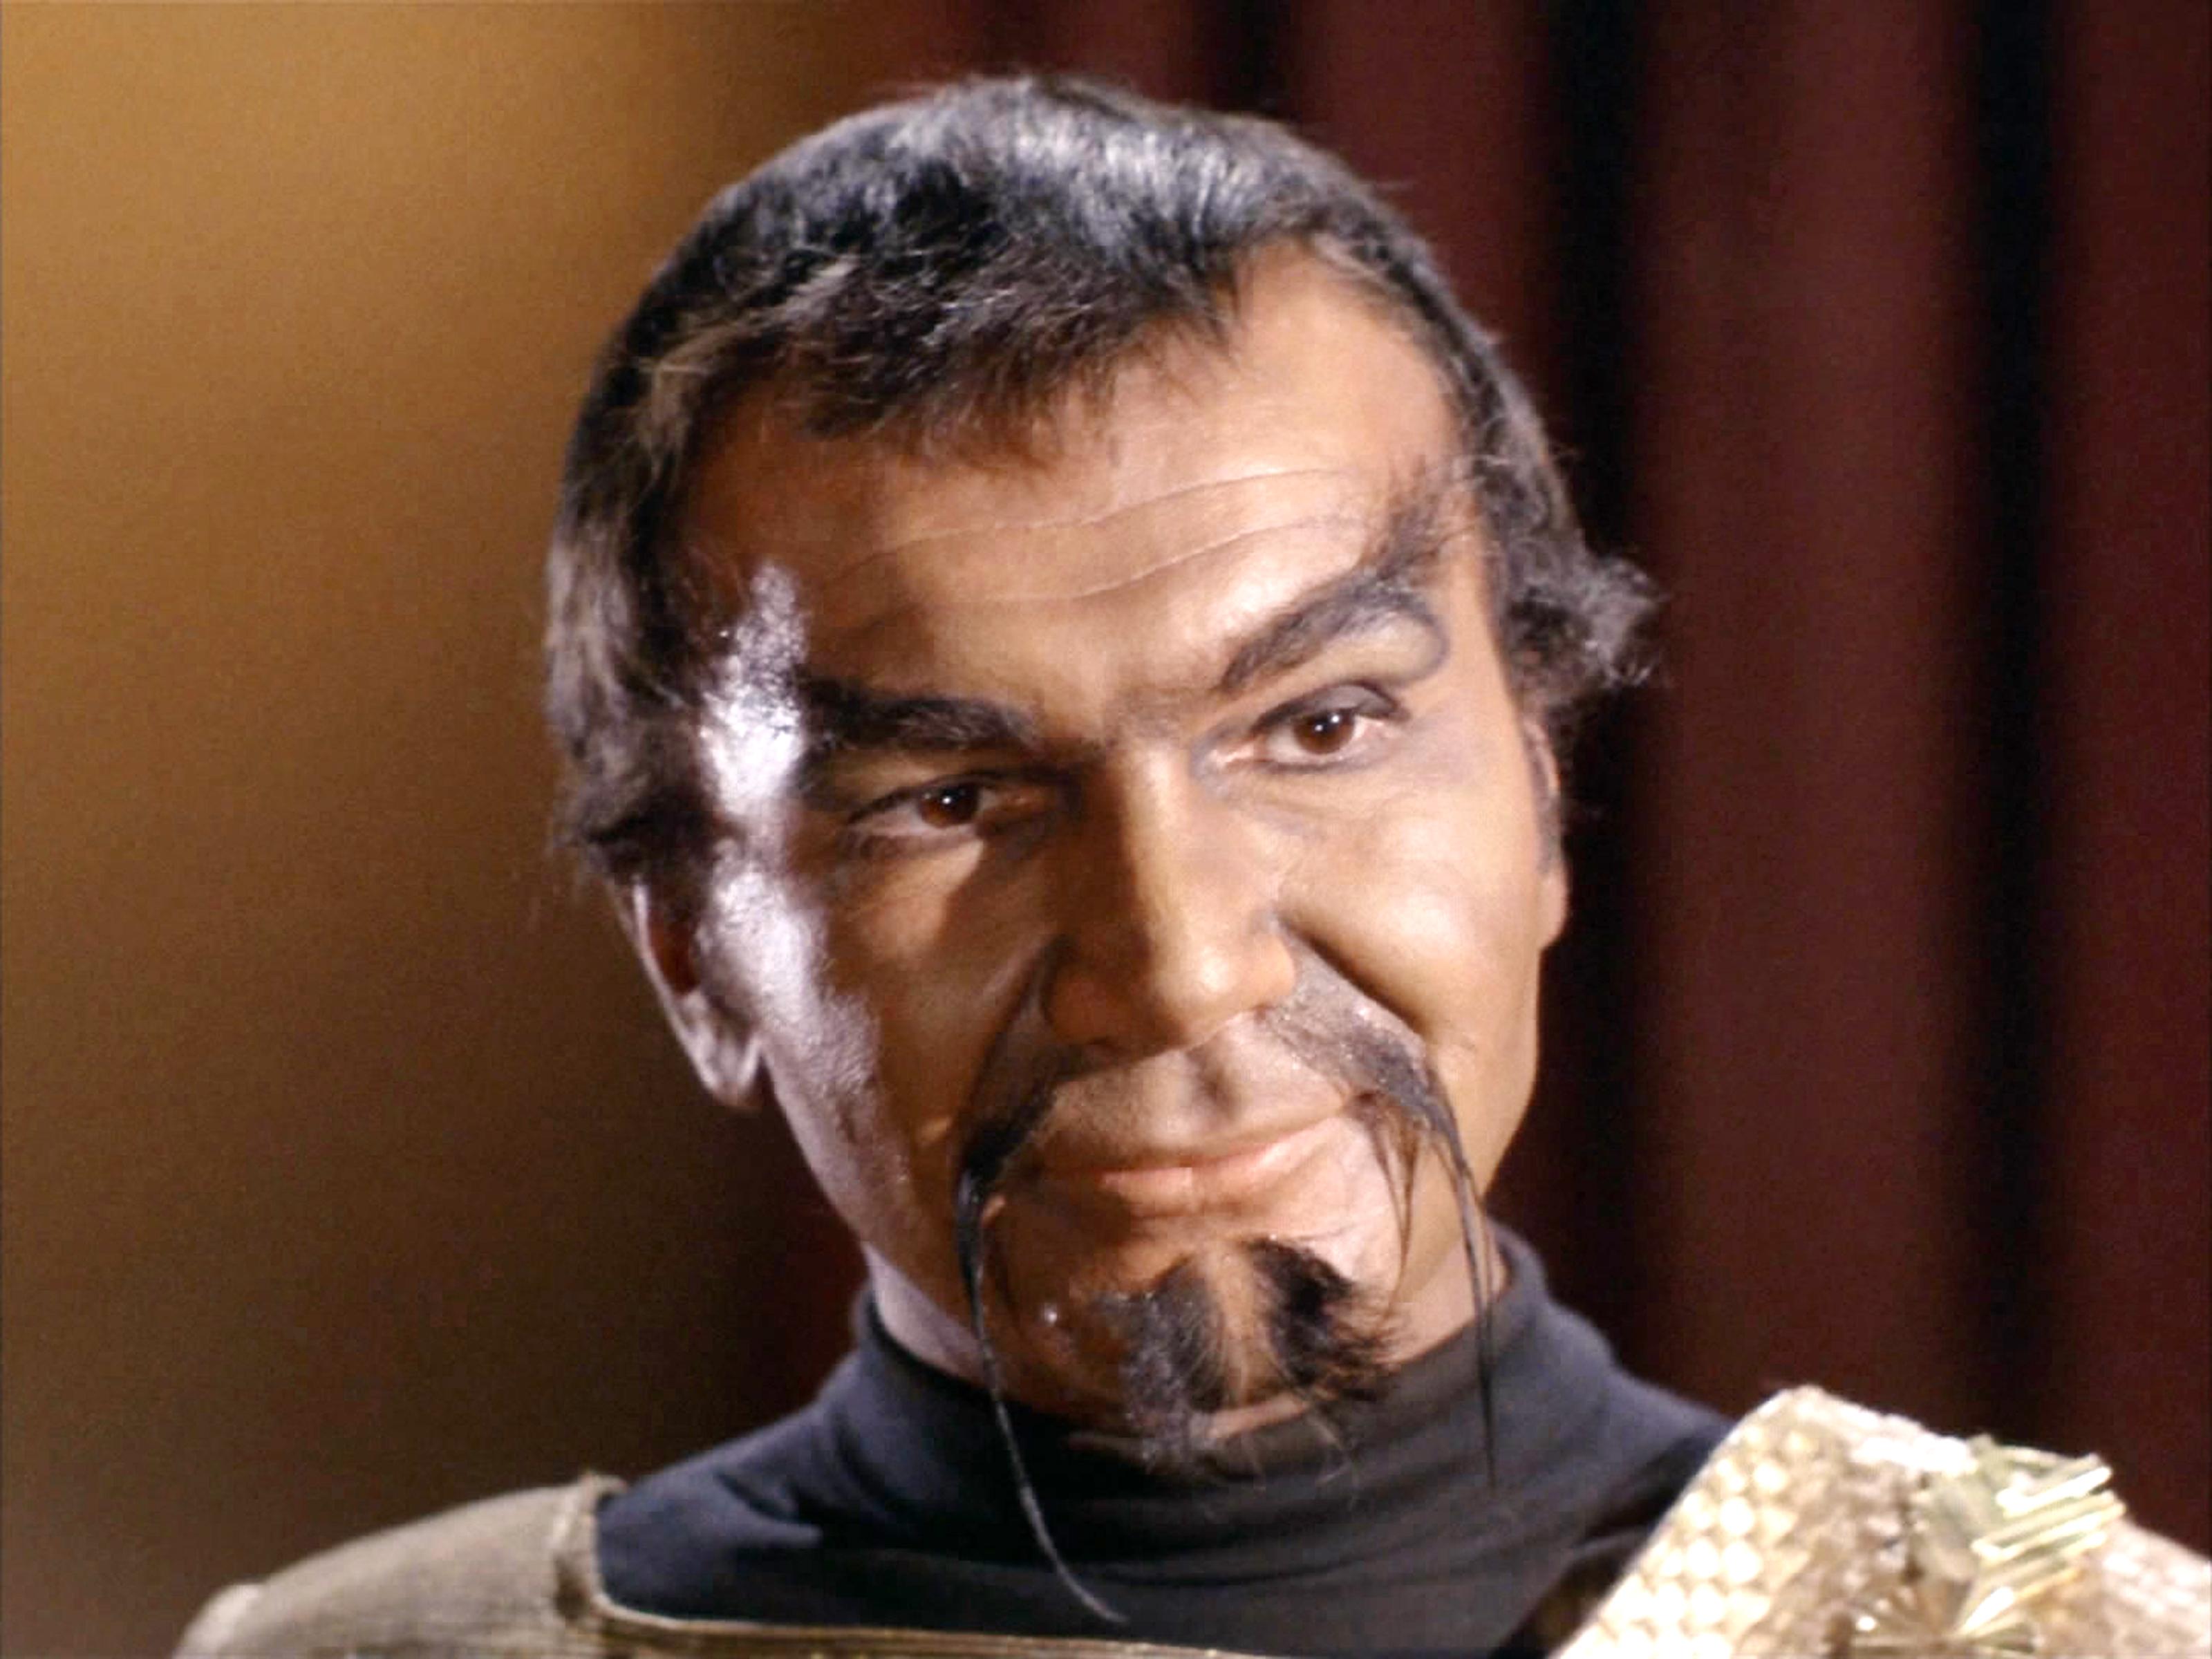 Seen here, John Colicos as Kor (a Klingon) in the STAR TREK episode,  Errand of Mercy.